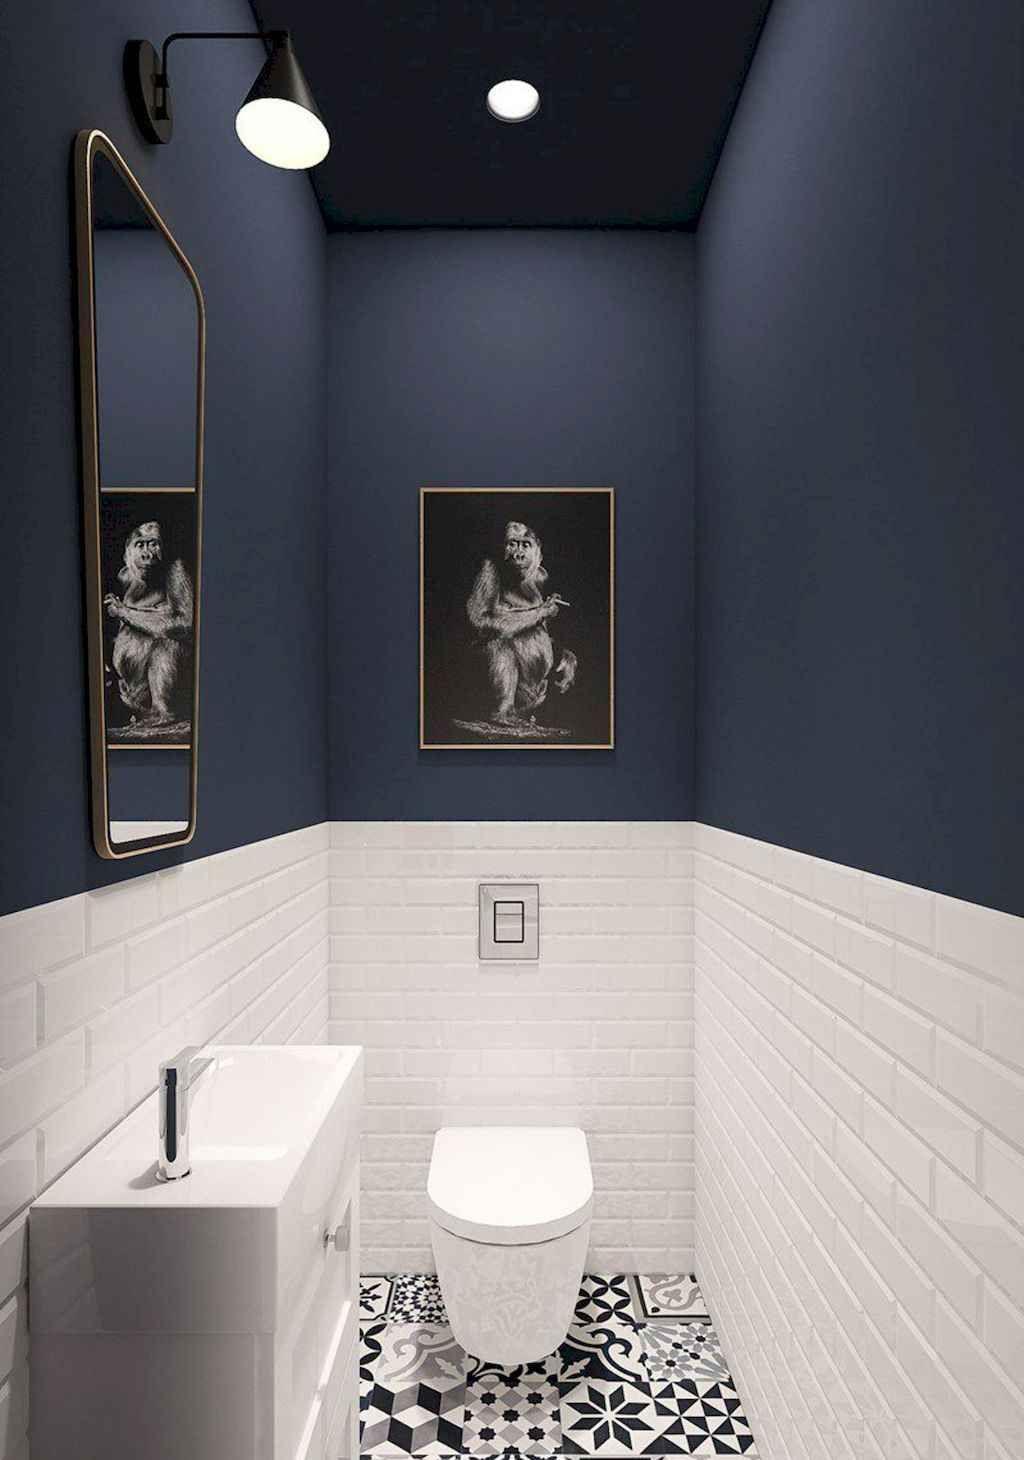 80 Cool Small Bathroom Remodel Ideas Spaciroom Com Idee Toilettes Idee Deco Wc Deco Toilettes